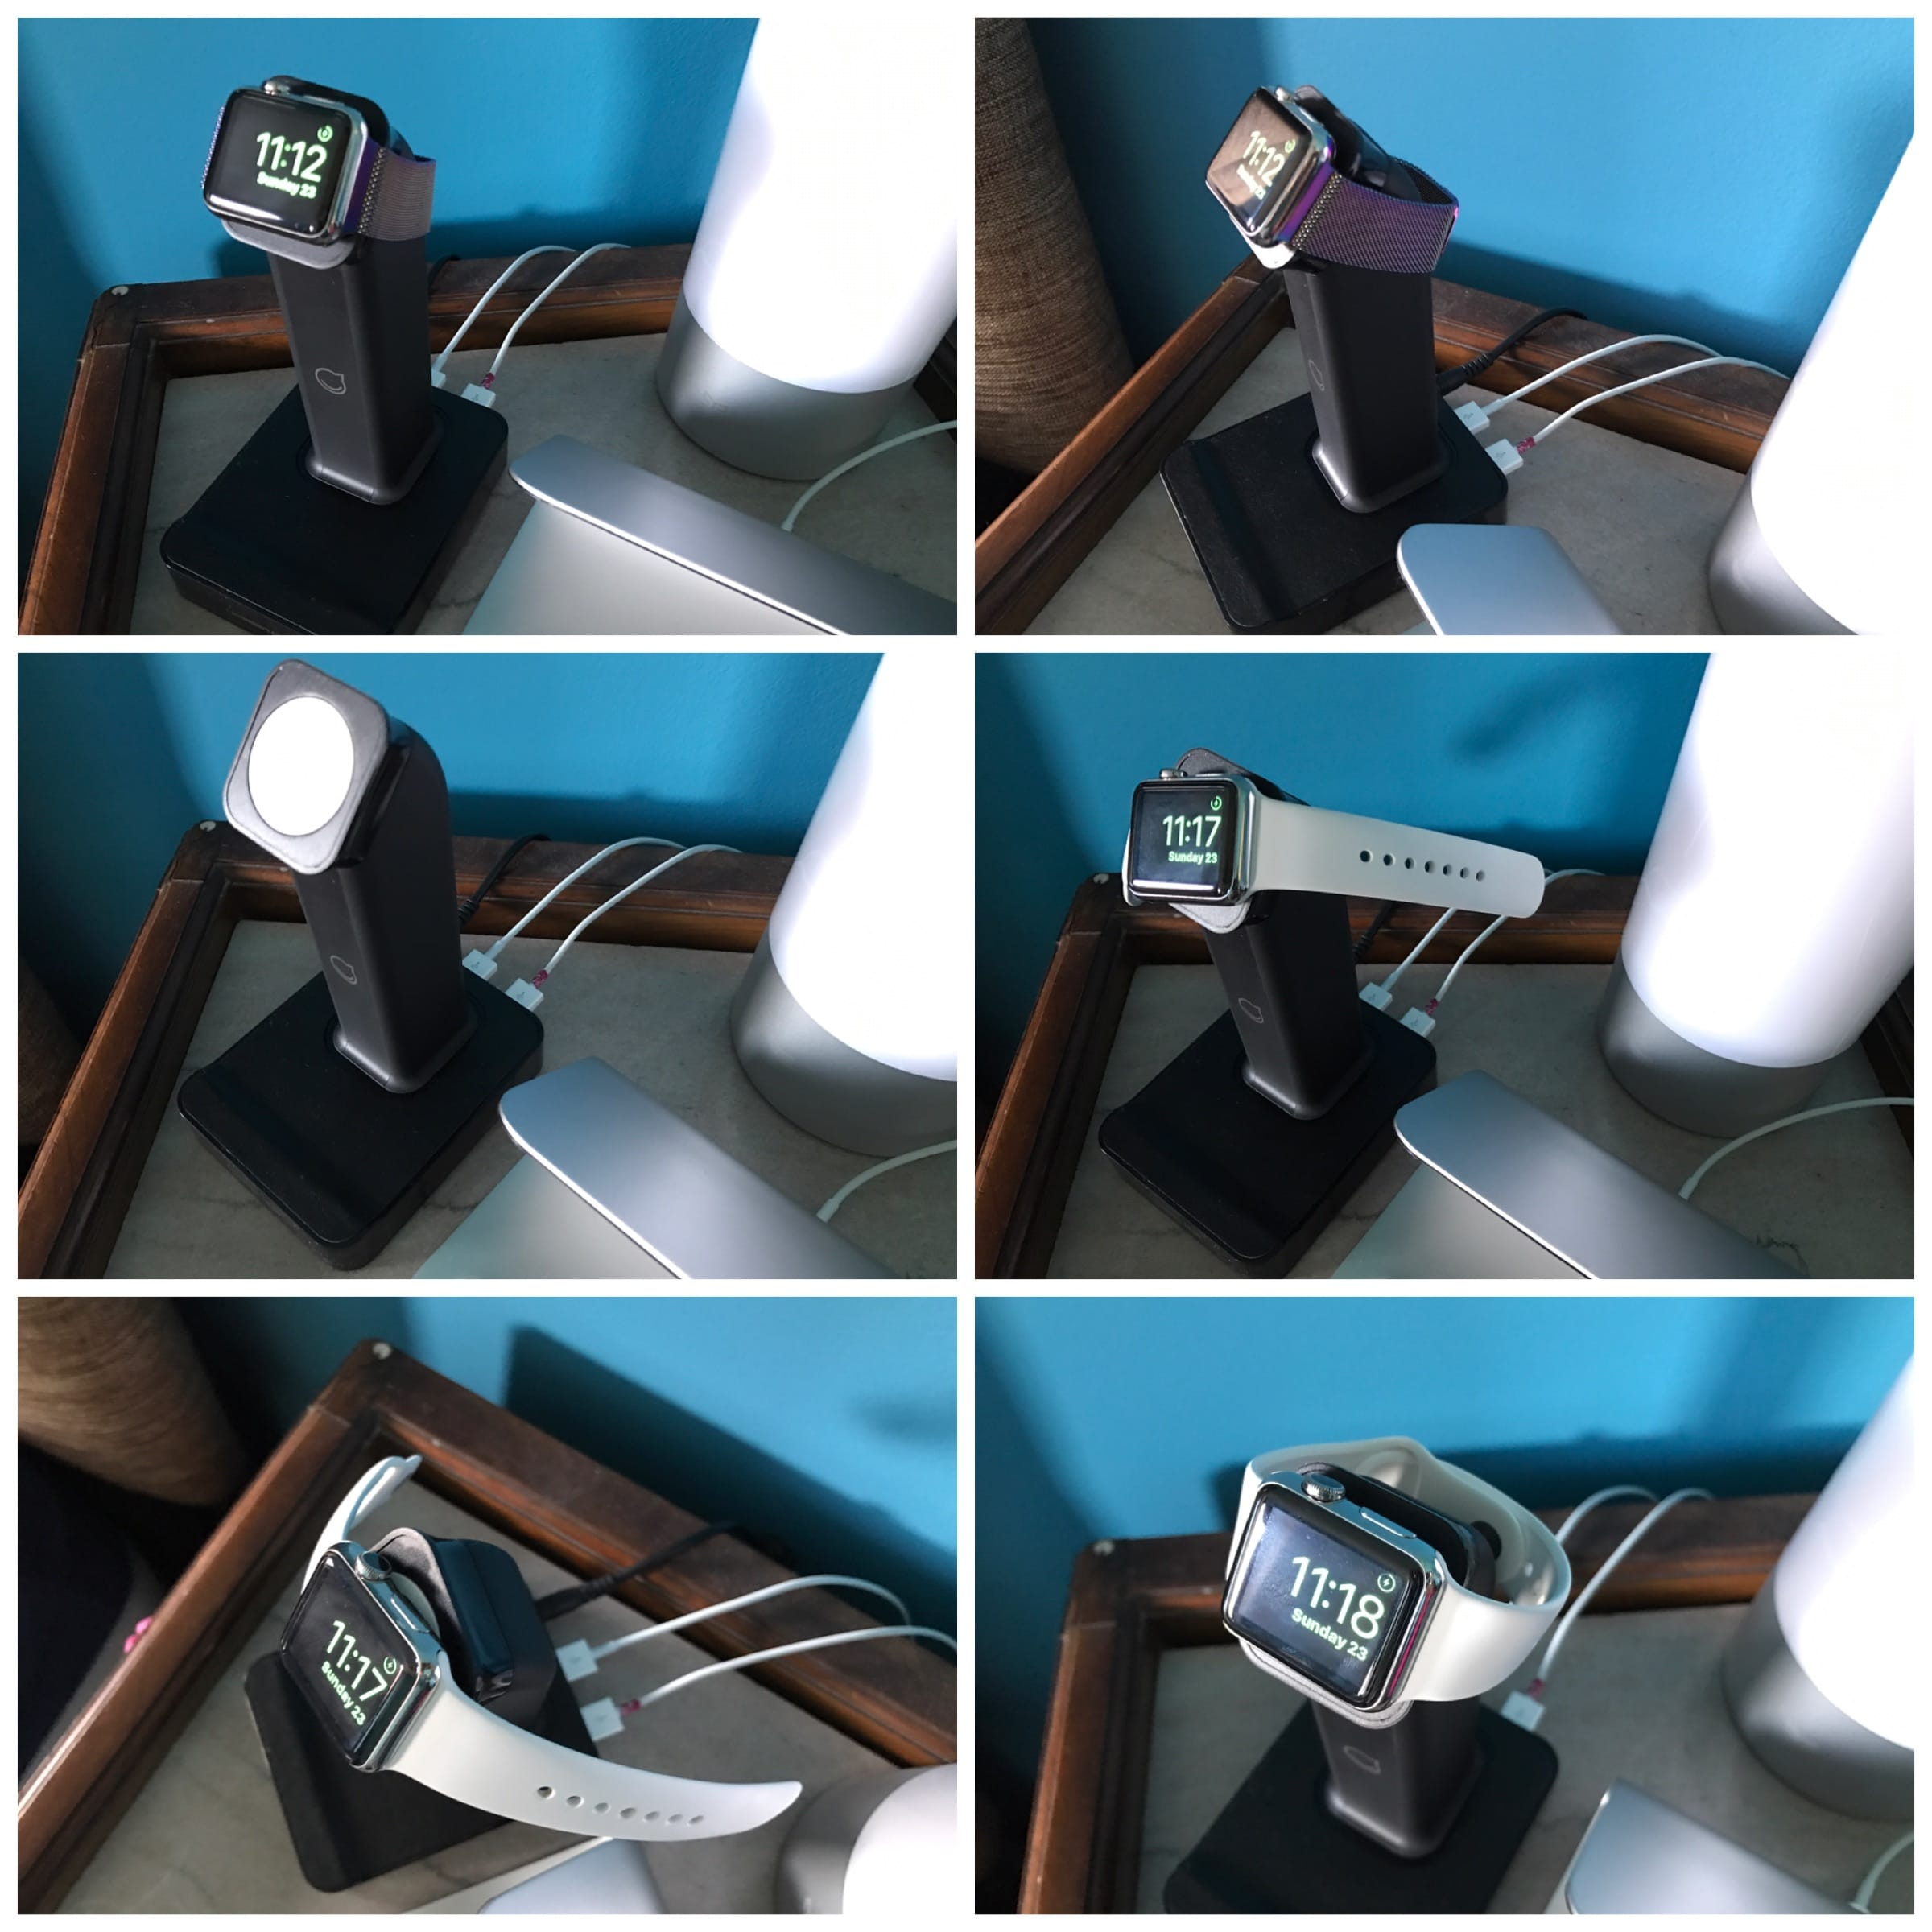 ce support pour apple watch charge aussi deux appareils. Black Bedroom Furniture Sets. Home Design Ideas